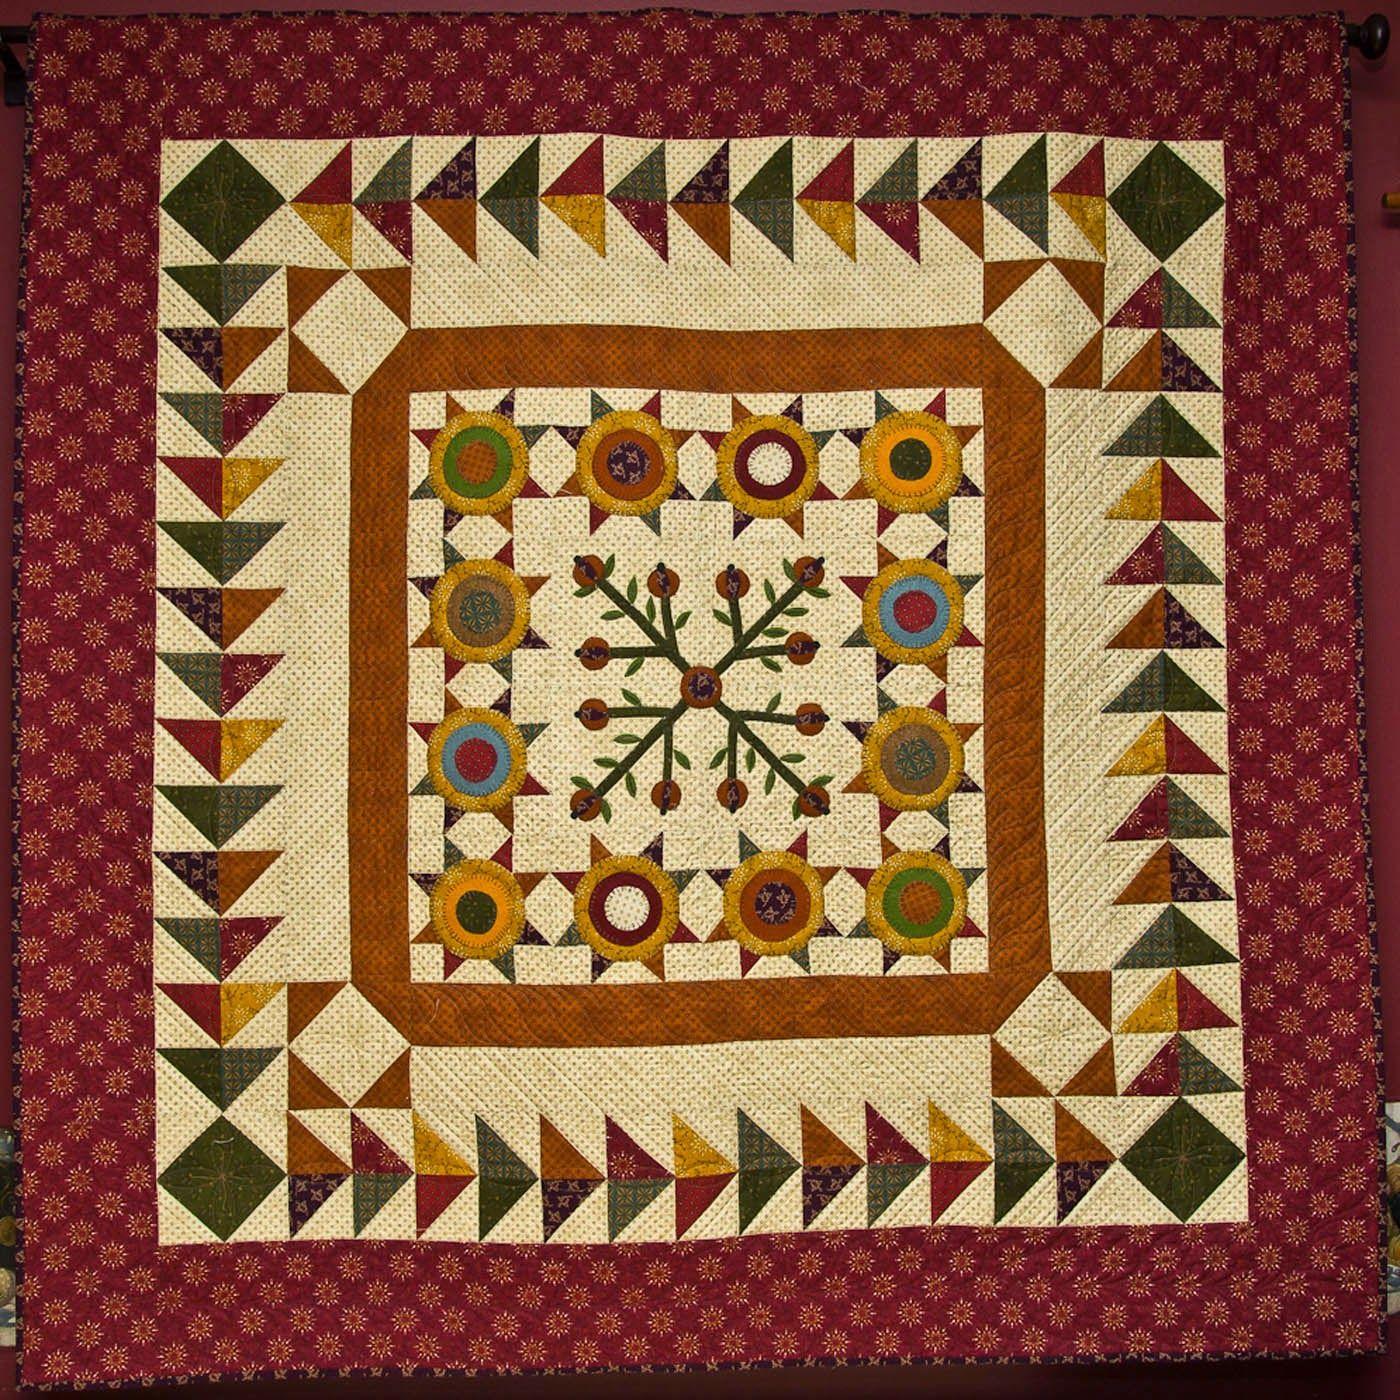 Henry Glass Fabrics: Desire To Inspire - December 2014 Edition